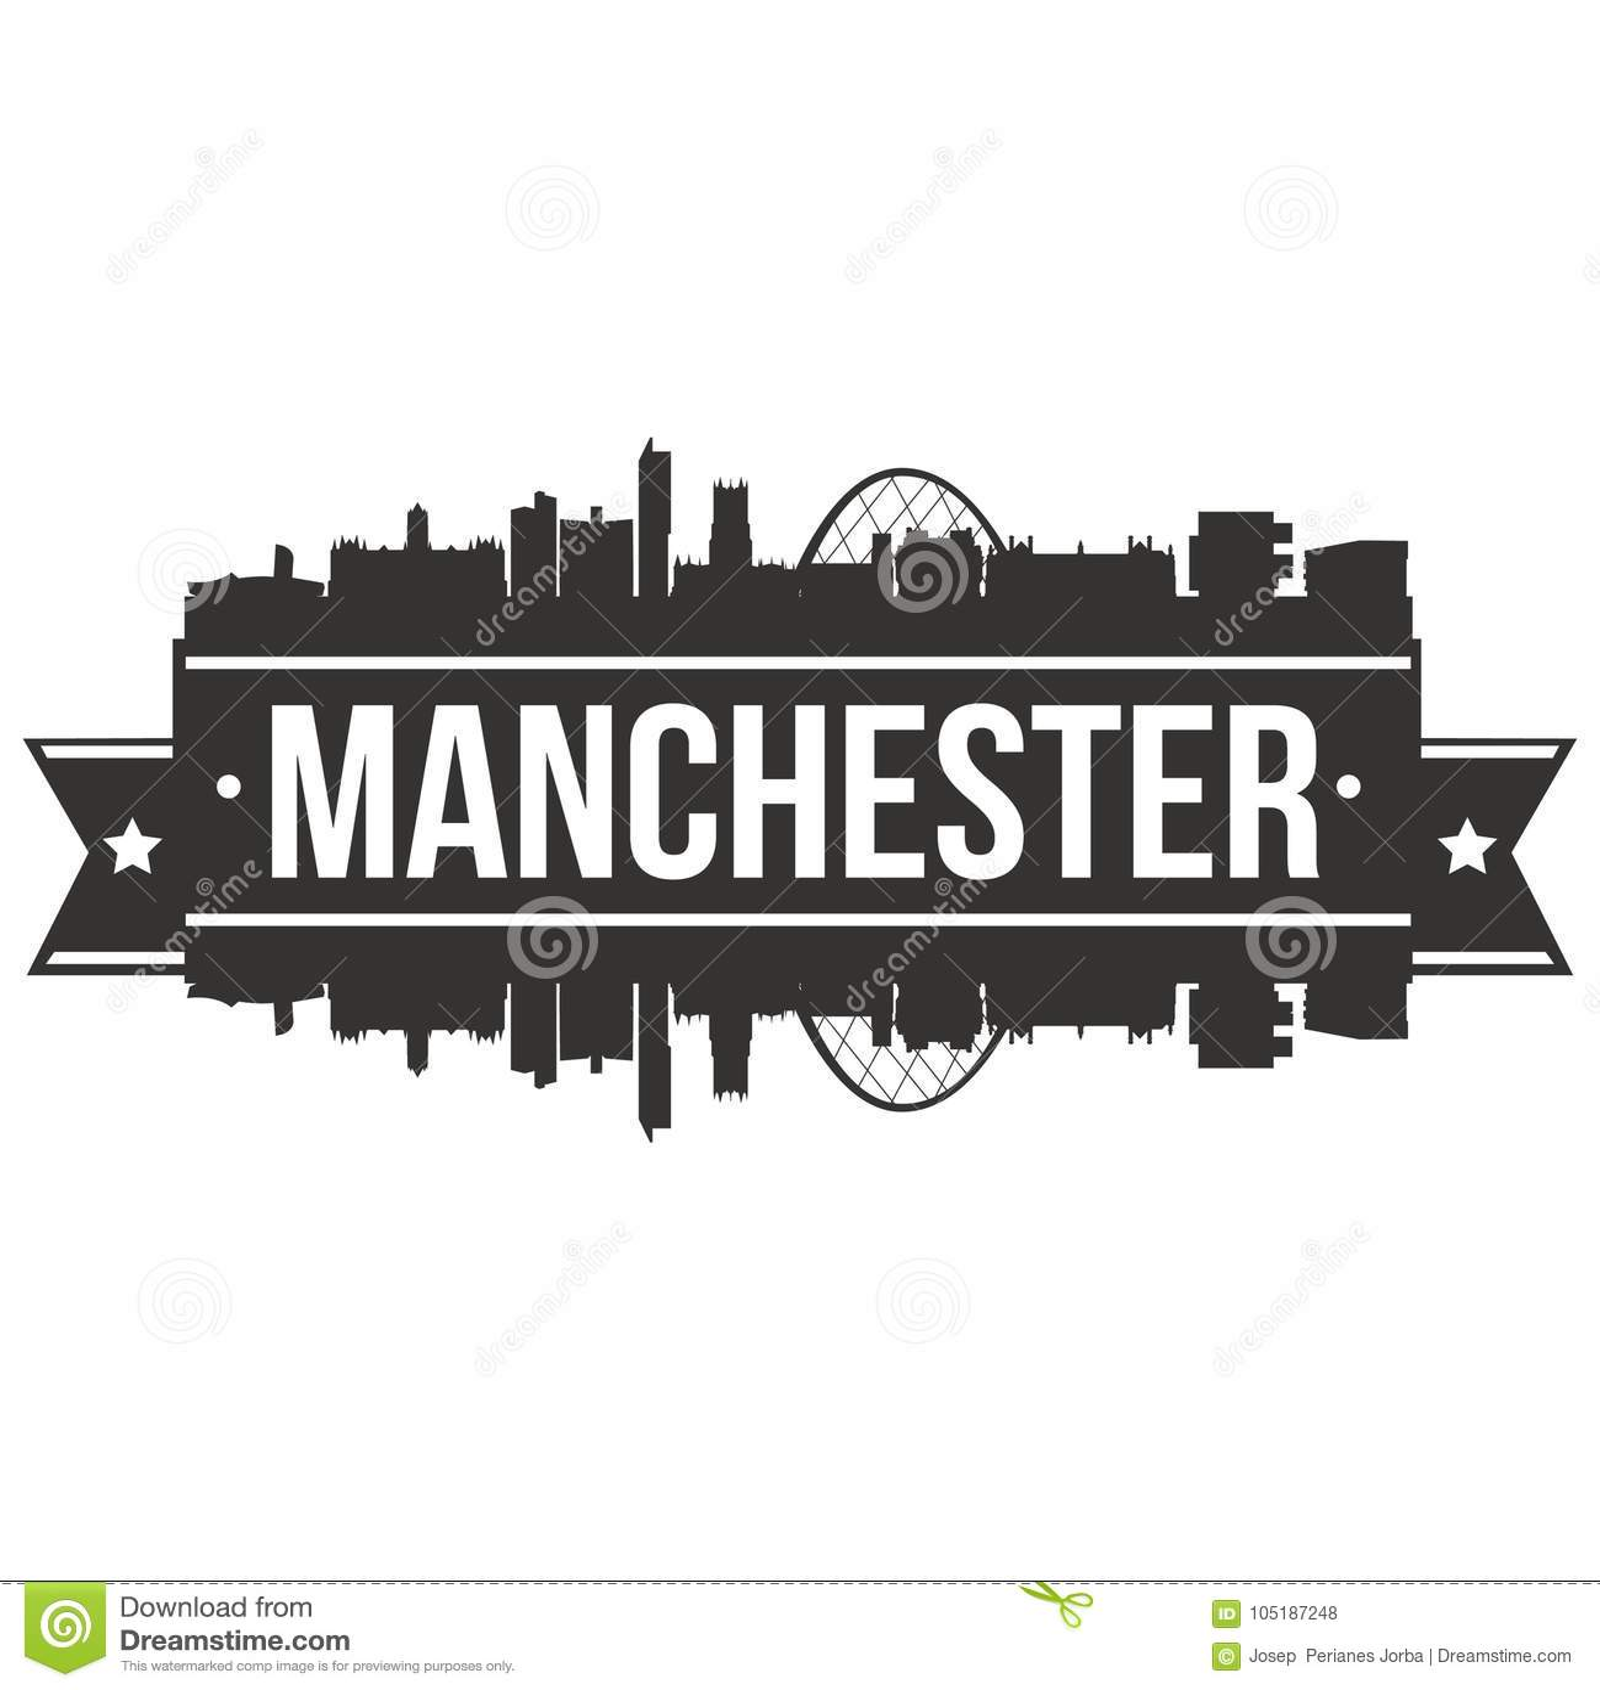 Манчестер юнайтед логотип вектор